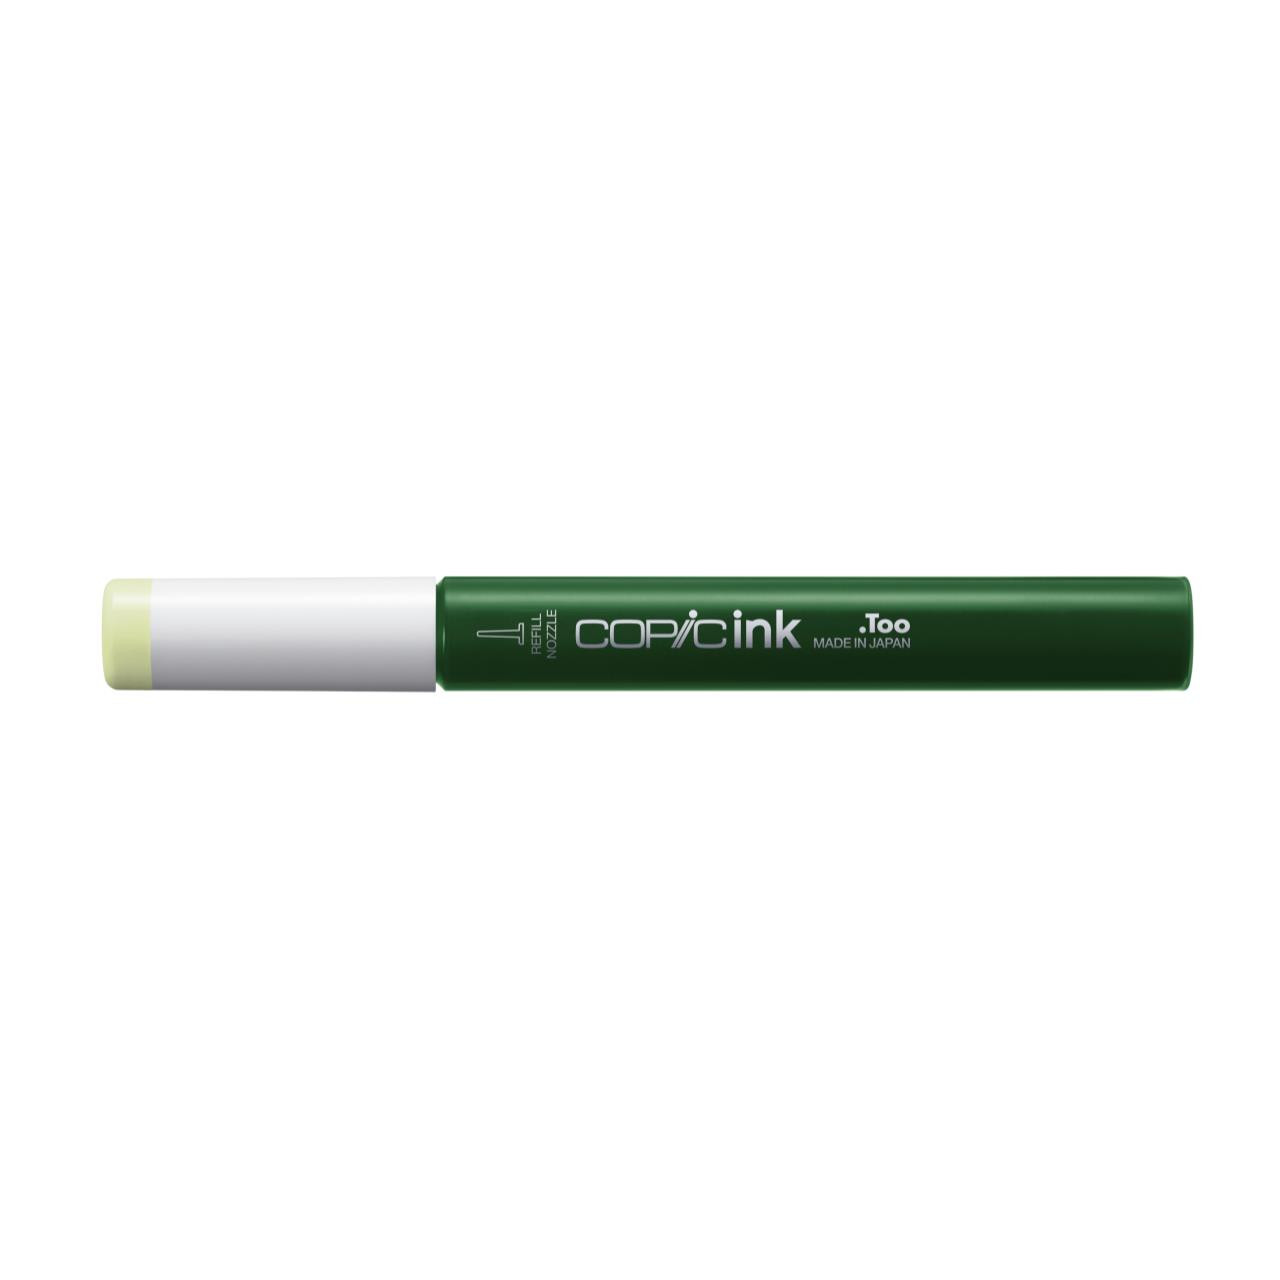 G20 Wax White, Copic Ink - 4511338057247